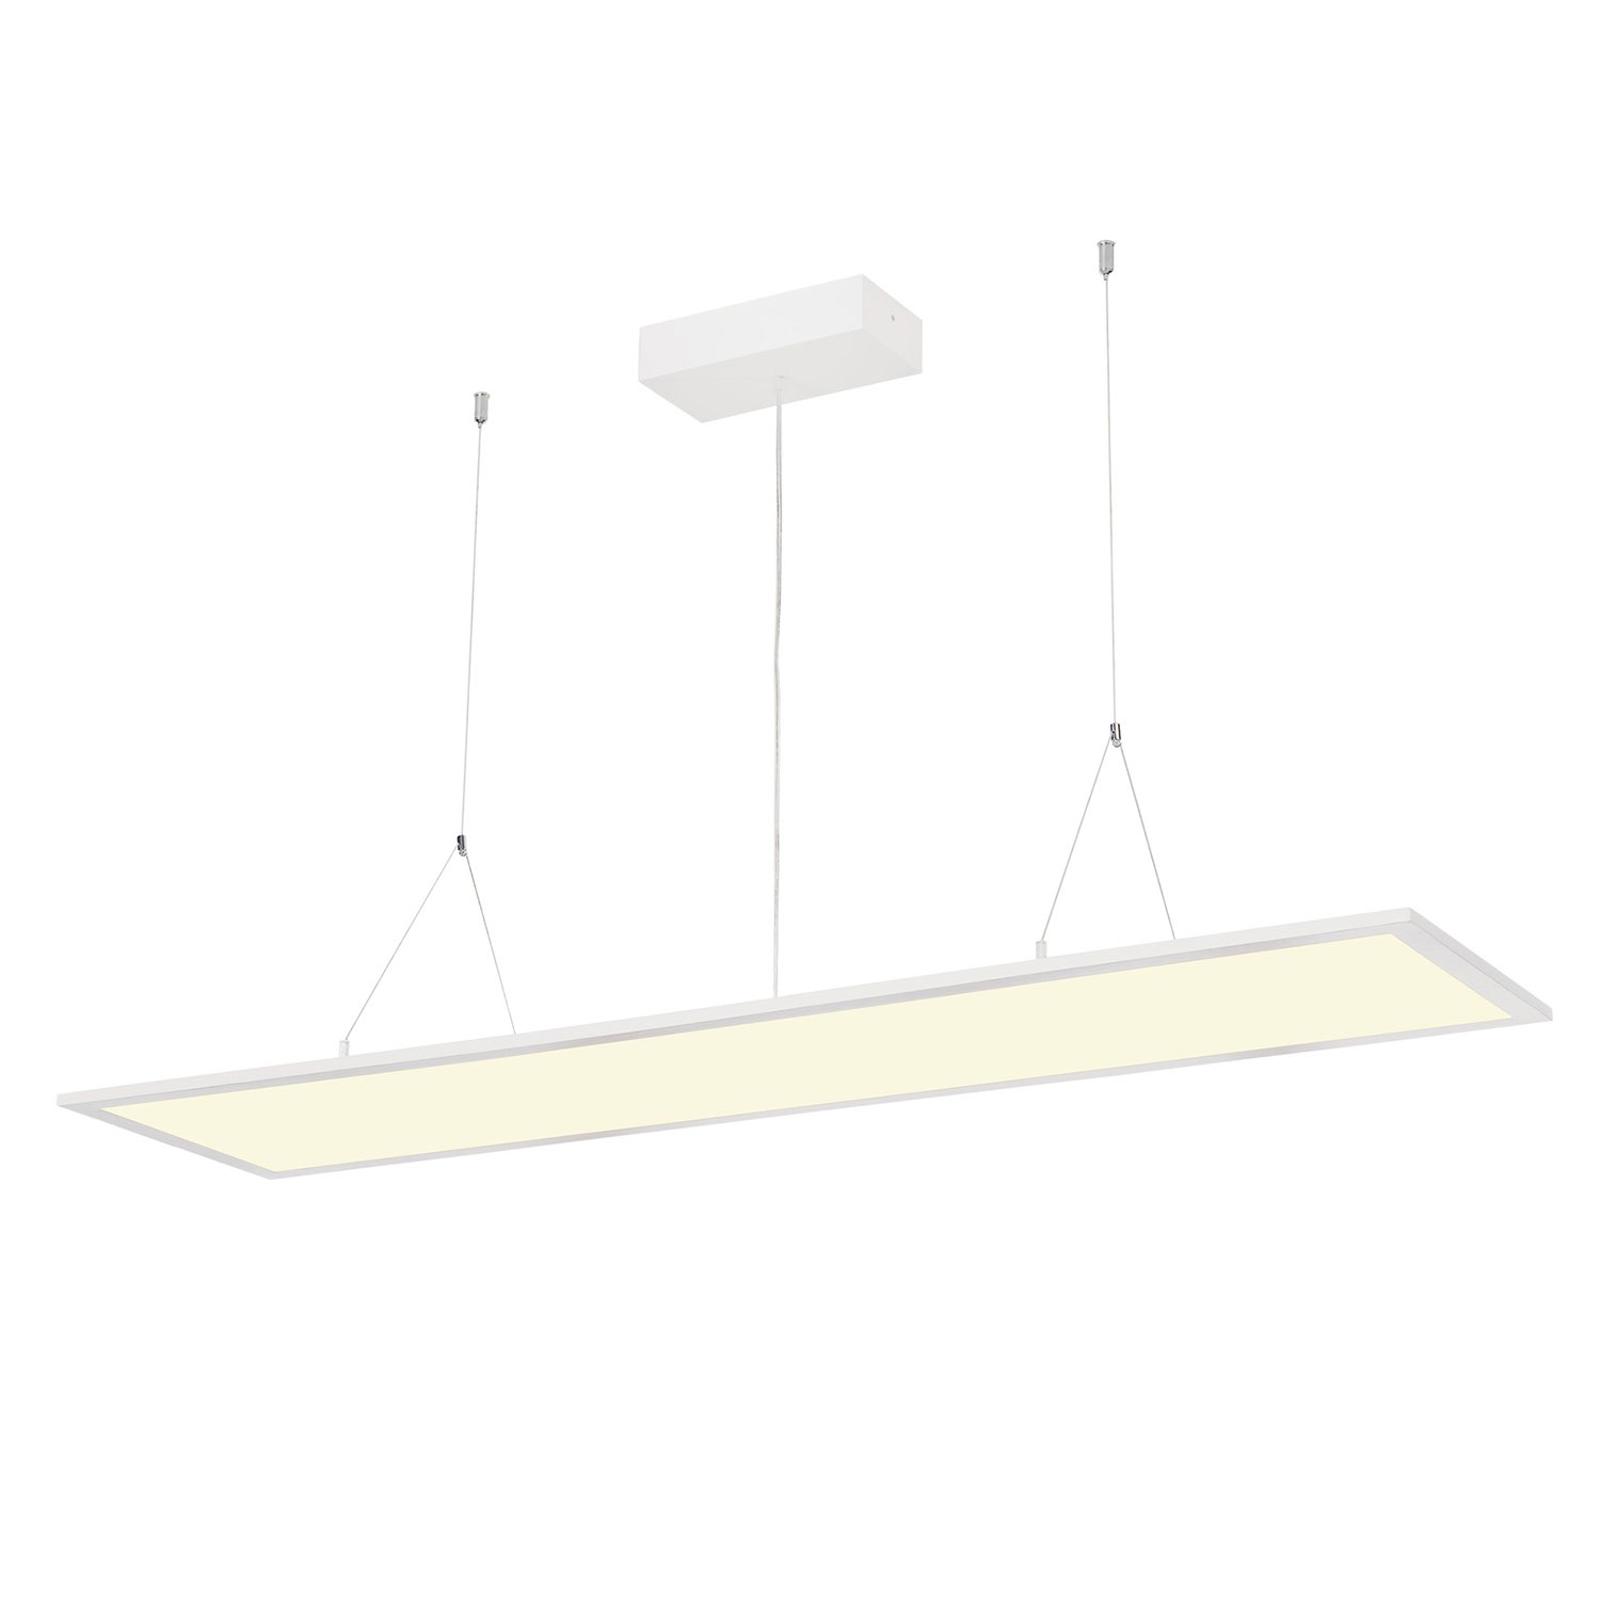 SLV I-Pendant Pro lampa wisząca biurowa 4000K